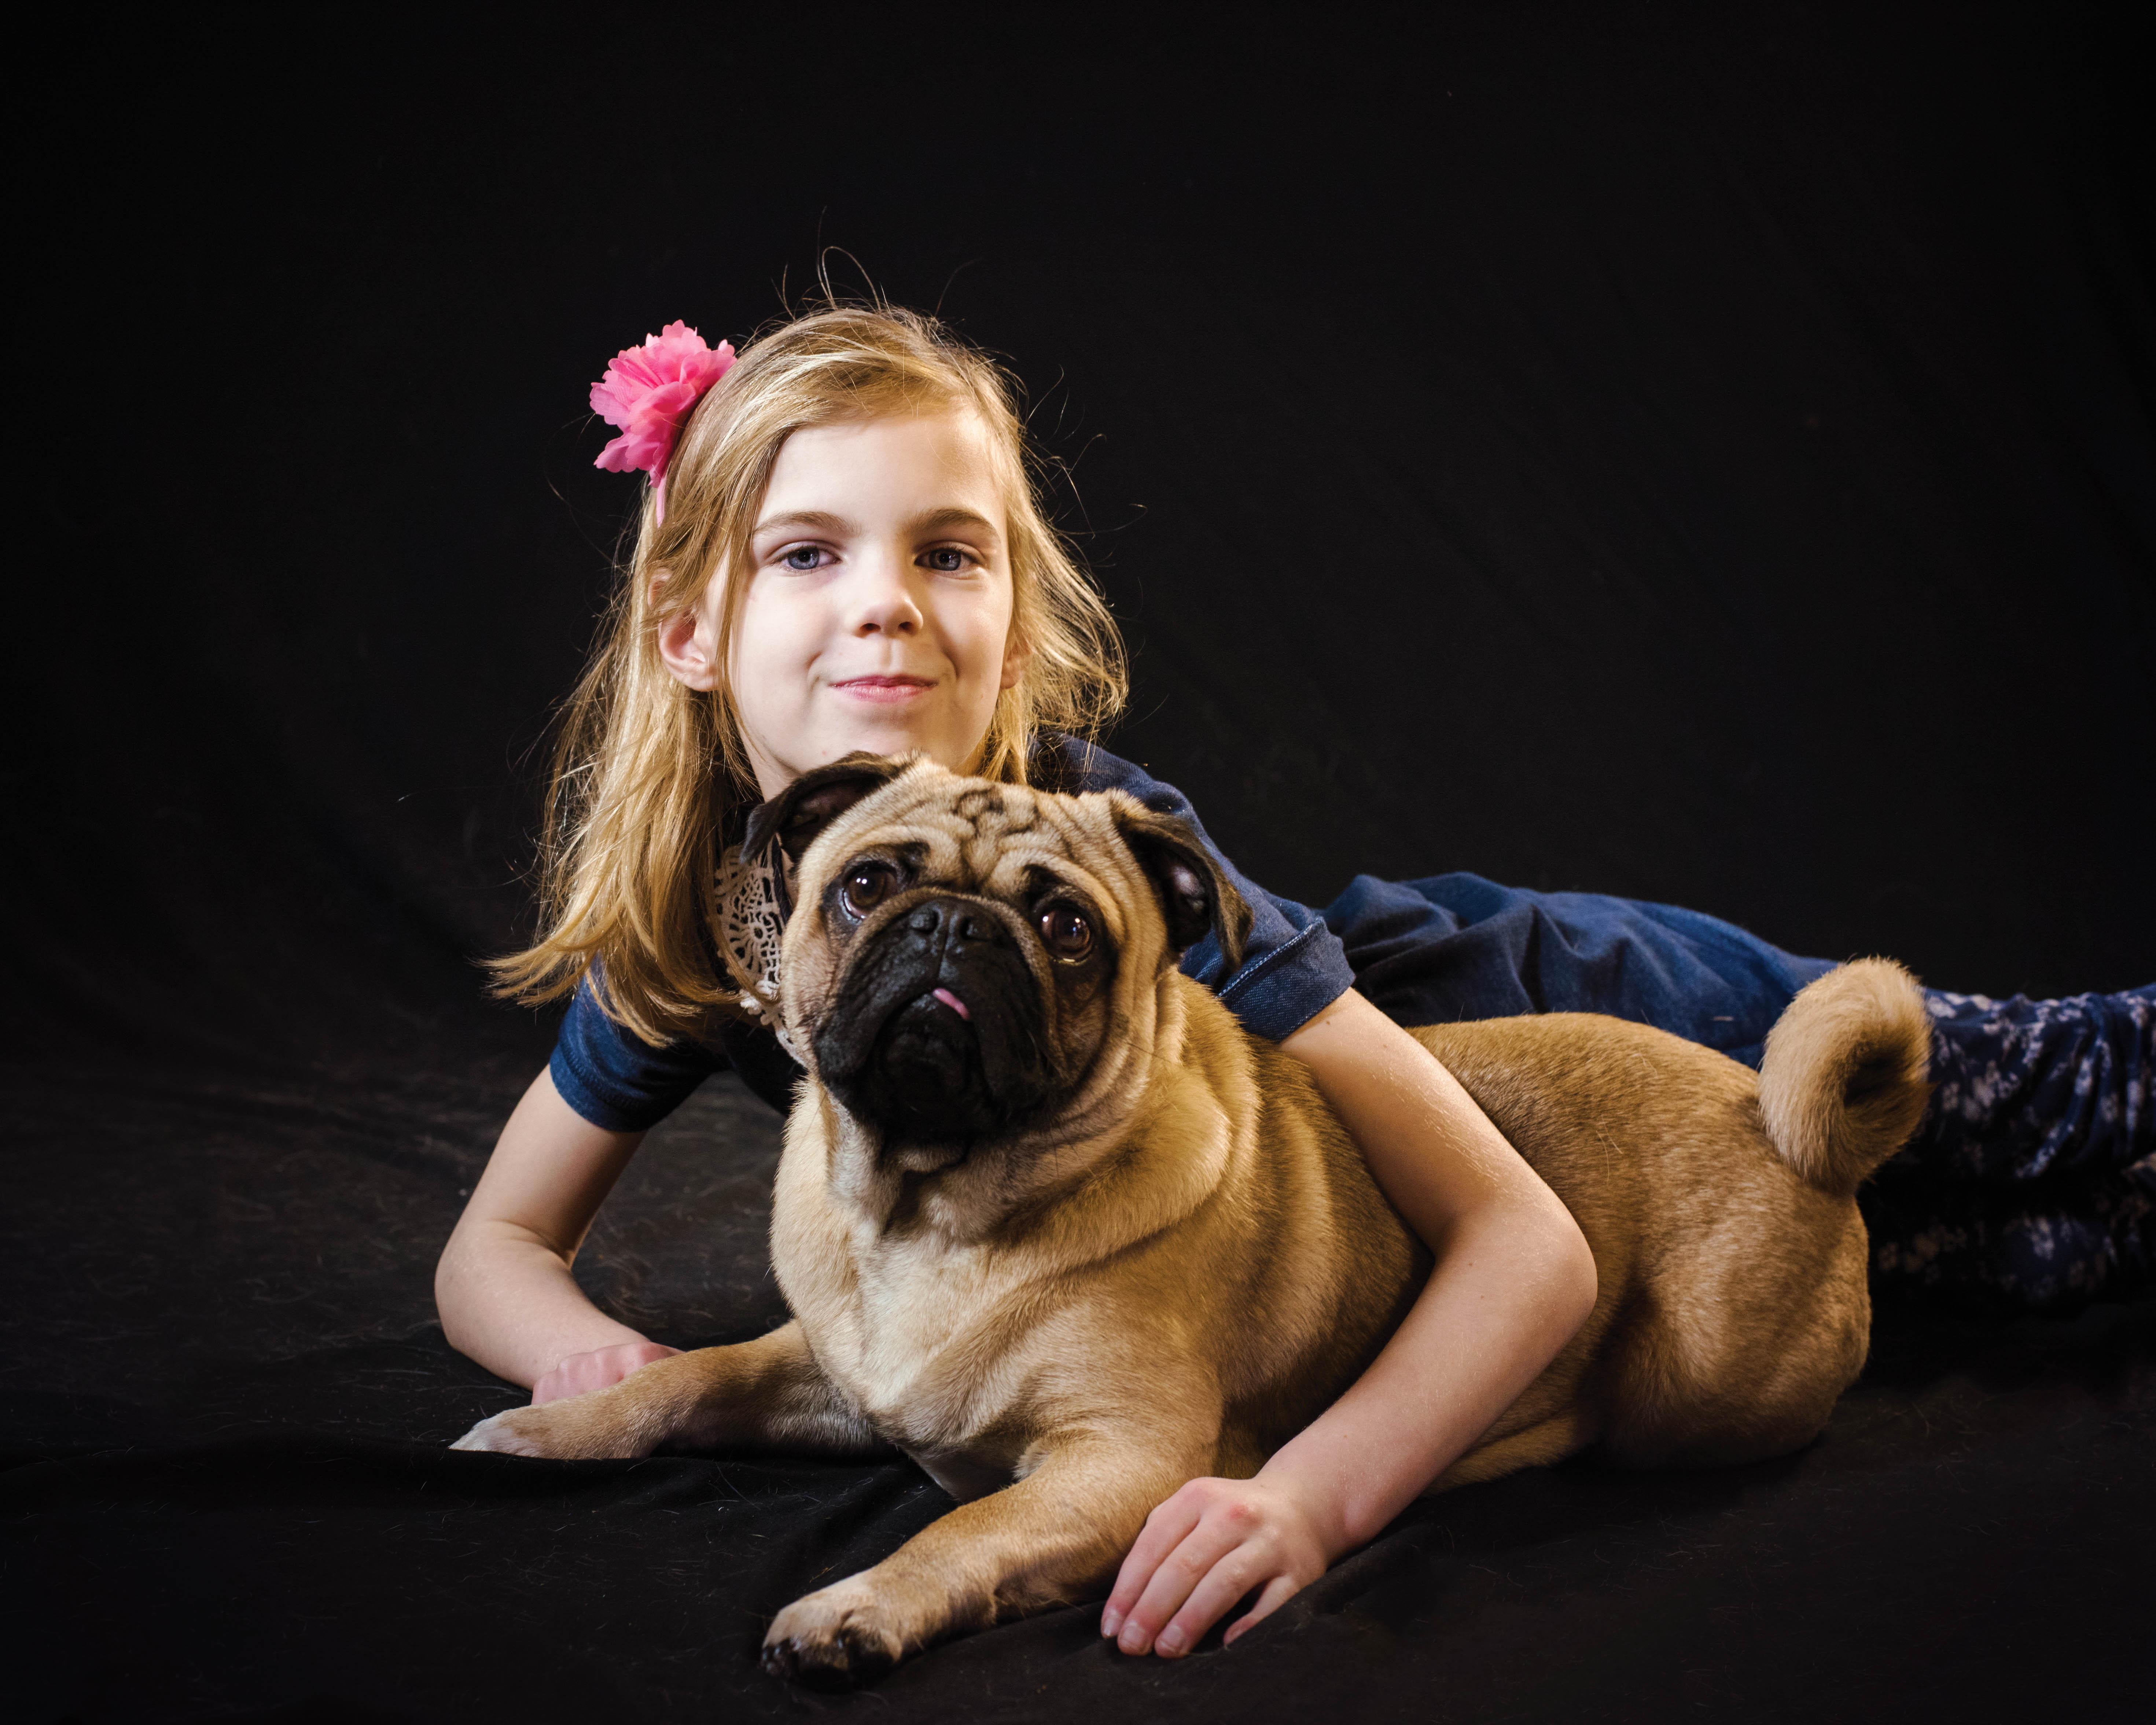 Pet_Photographer_Colchester_cute_pug